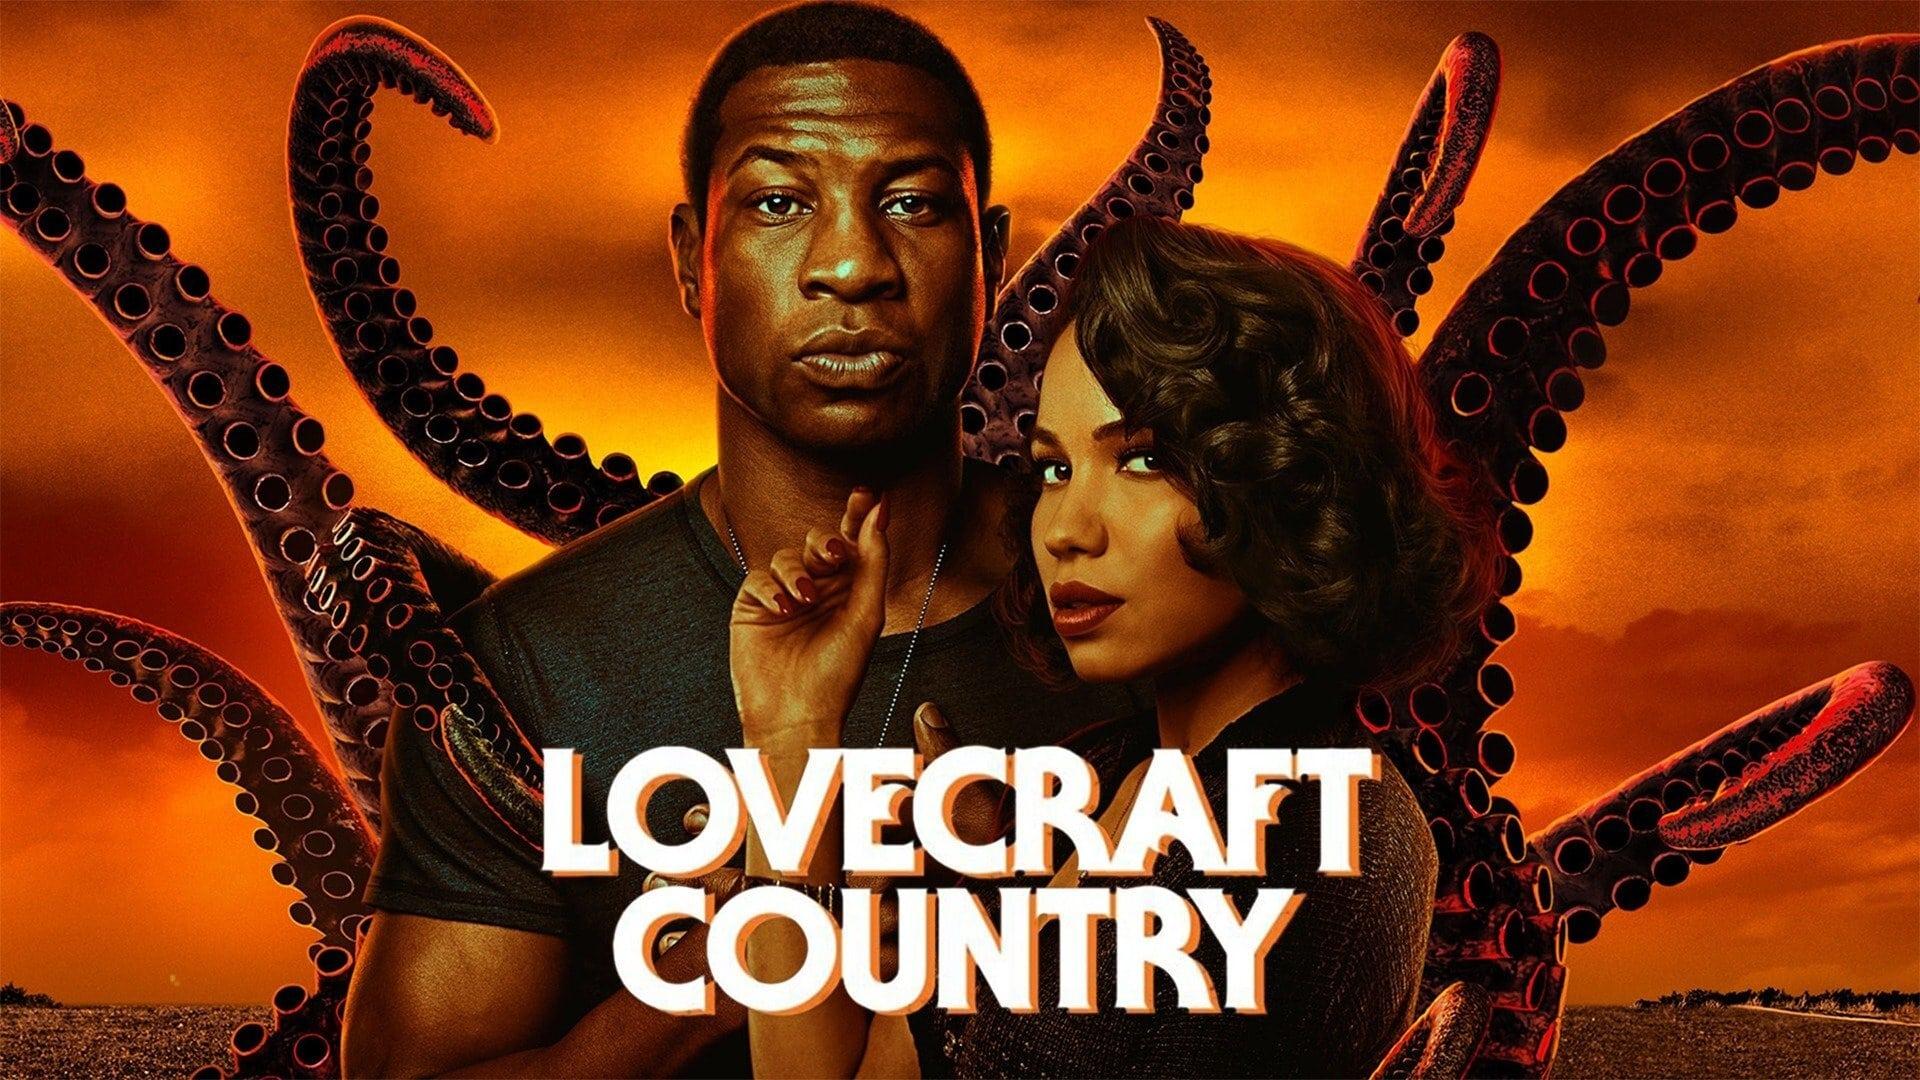 Lovecraft Country Season 1 Episode 4